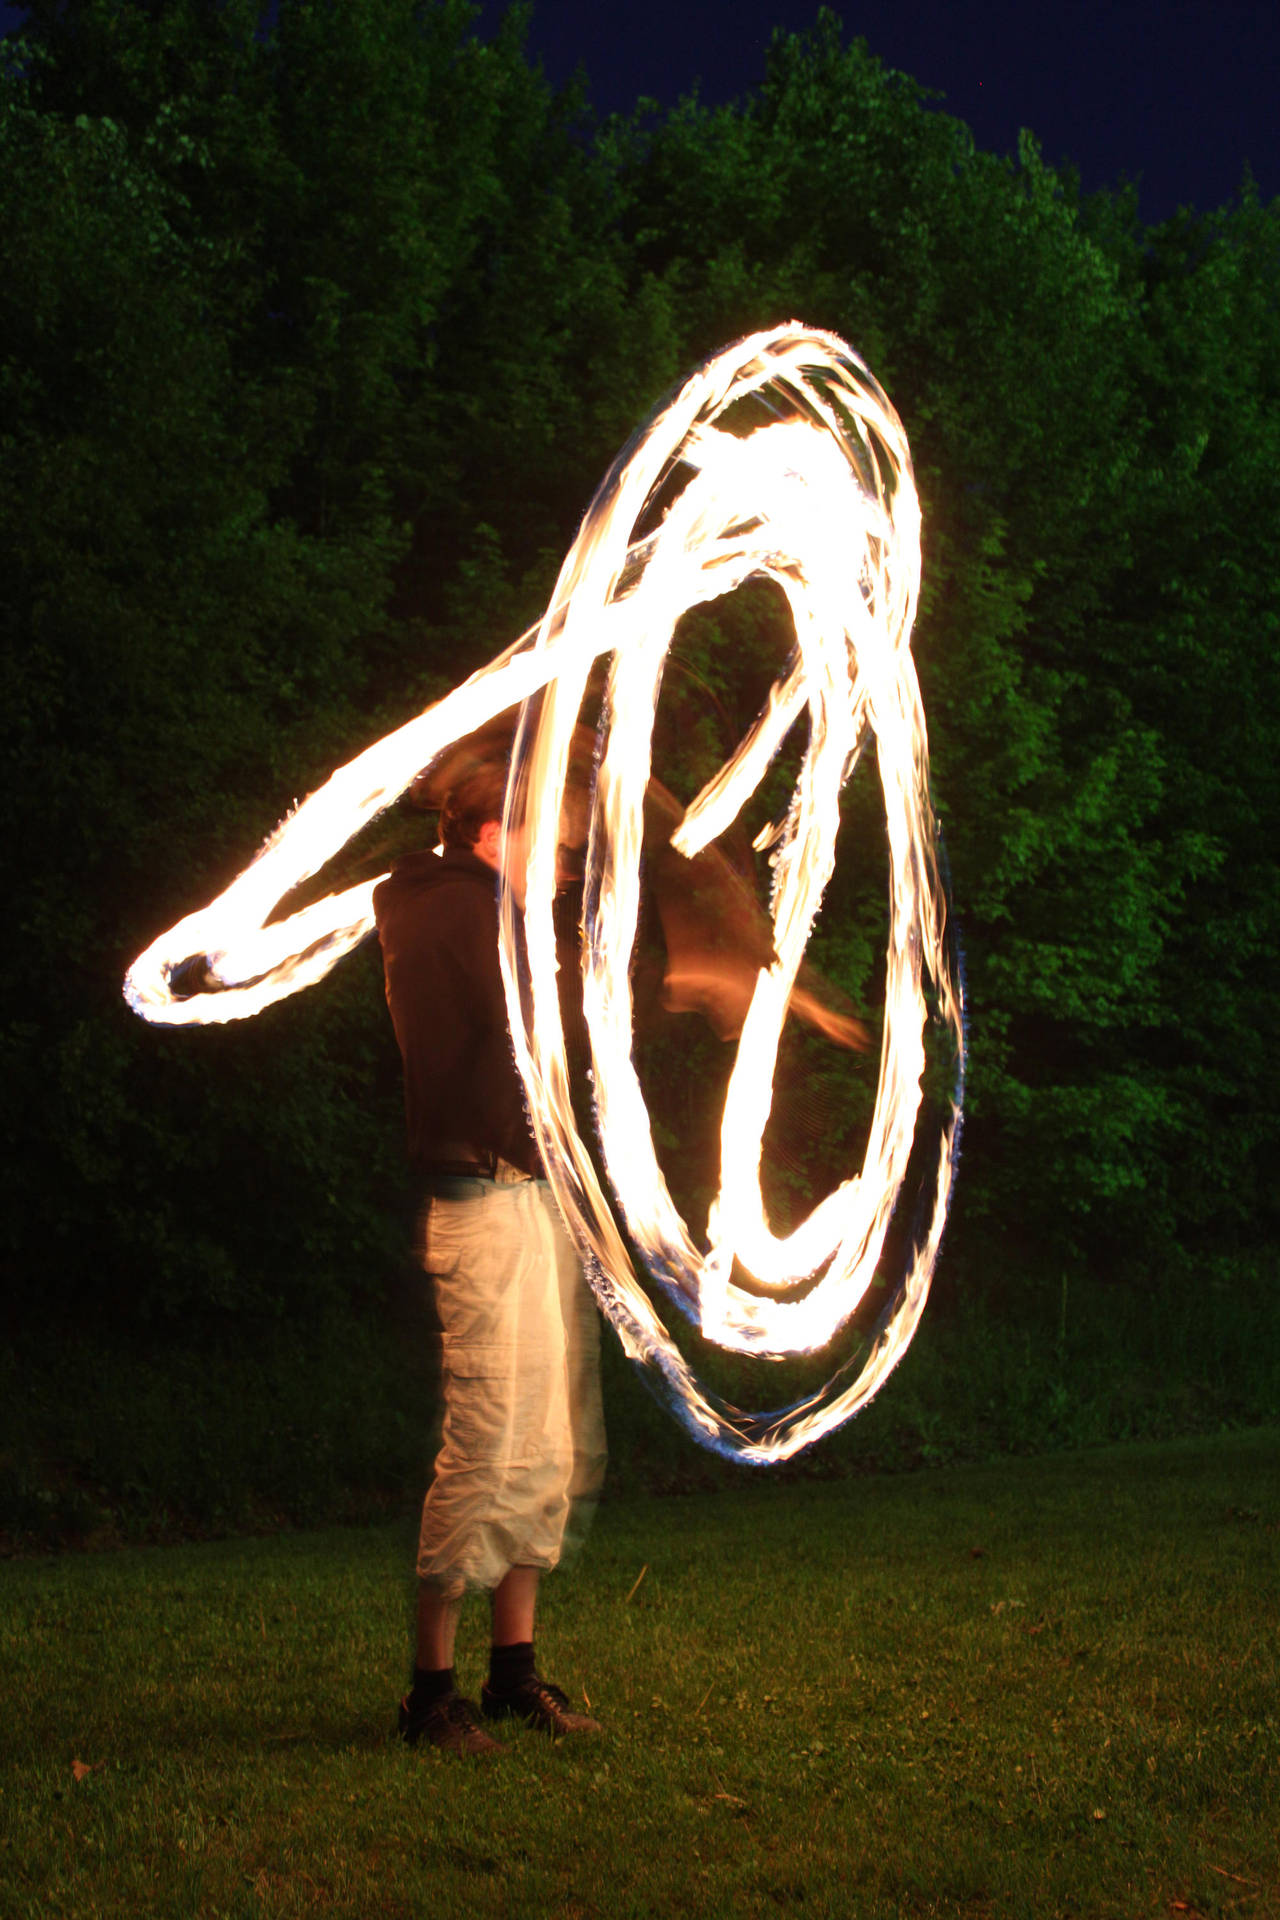 Fire Poi 2 by zertrin